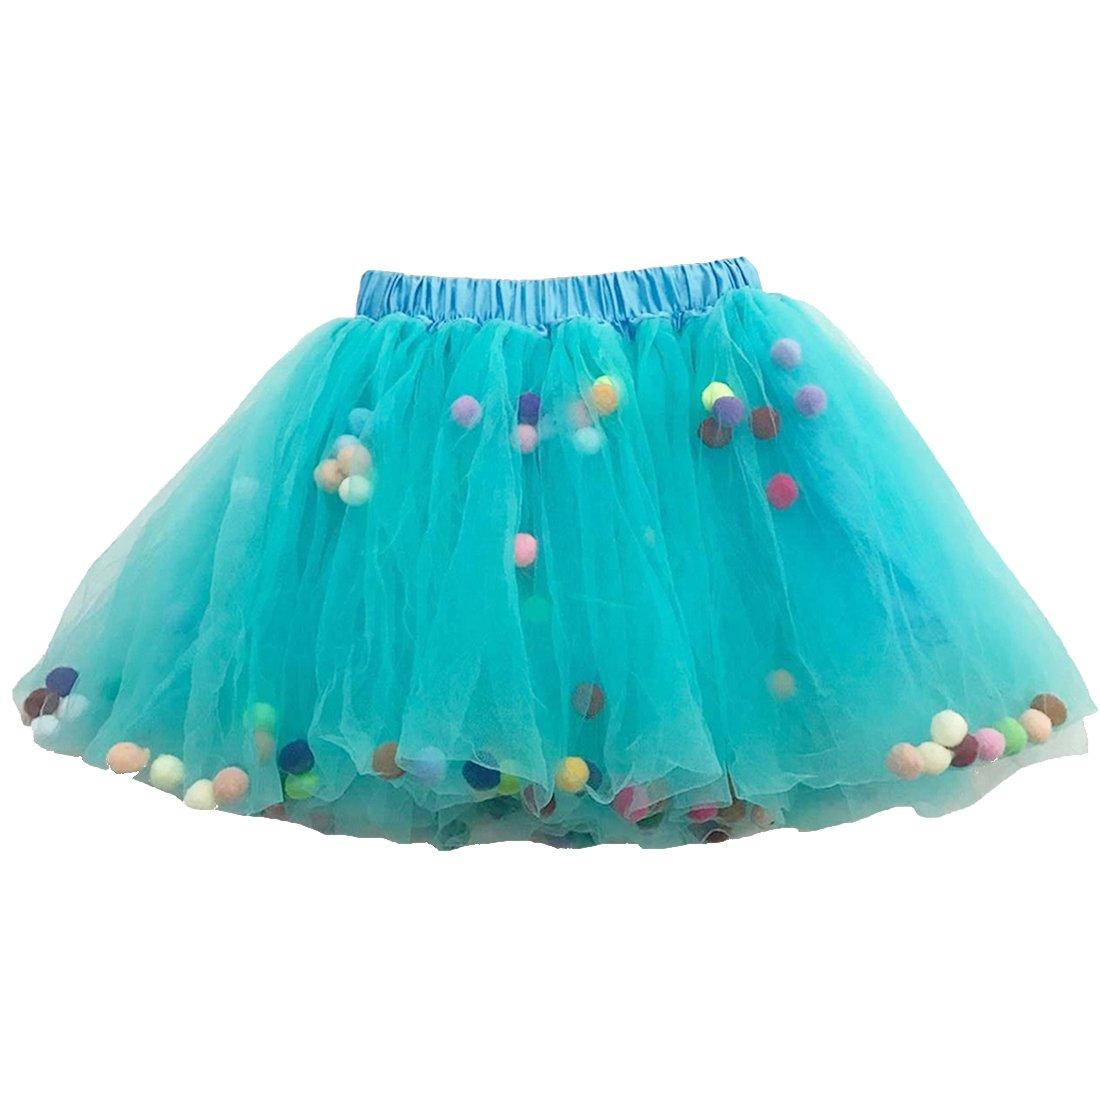 Buenos Ninos Girl's 3 Layers Sequin Ballet Dance Skirt with Pom Pom Puff Ball Dress-up Tutu Blue